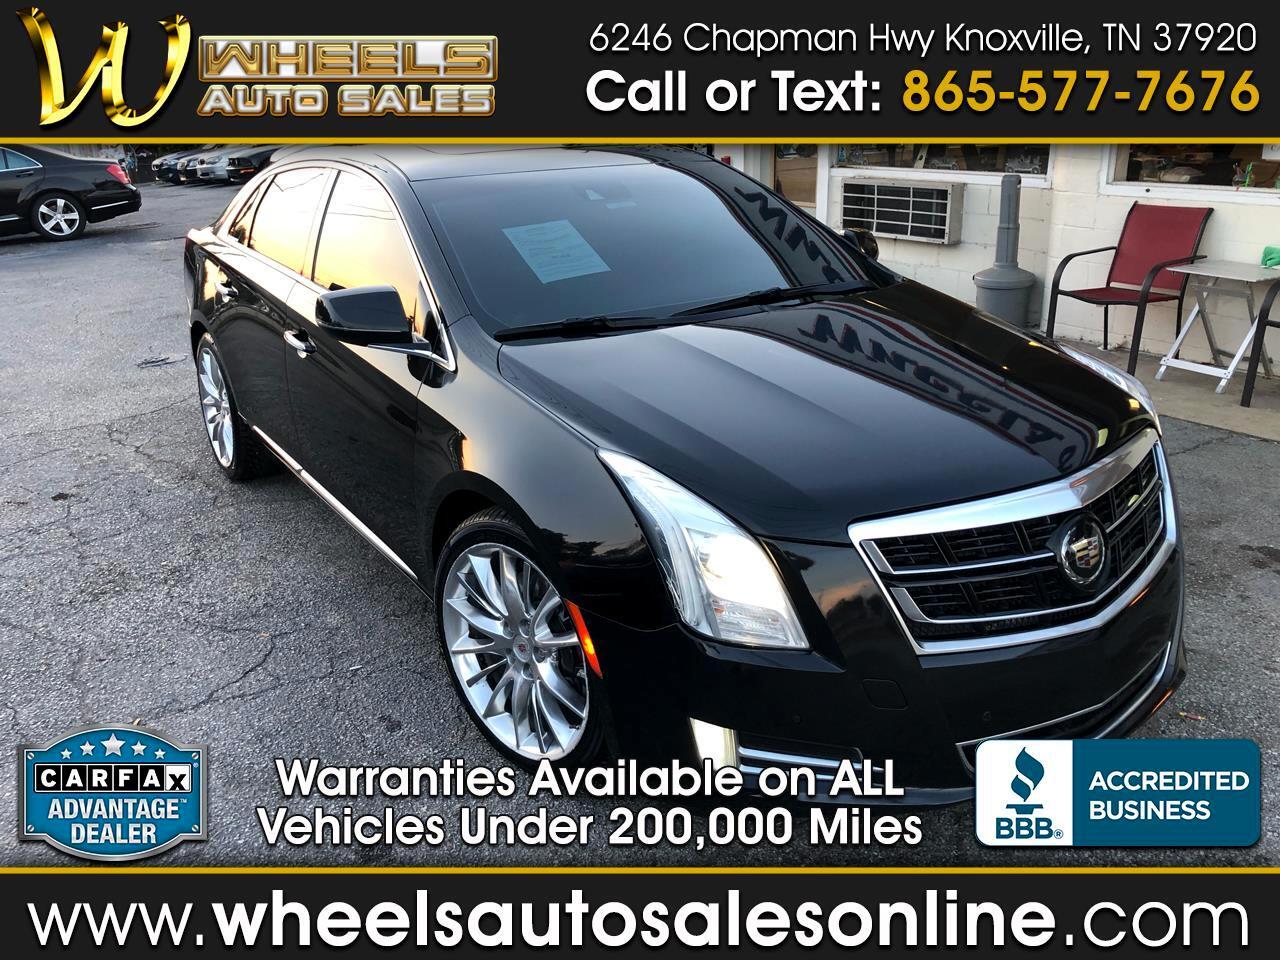 2014 Cadillac XTS 4dr Sdn Vsport Platinum AWD